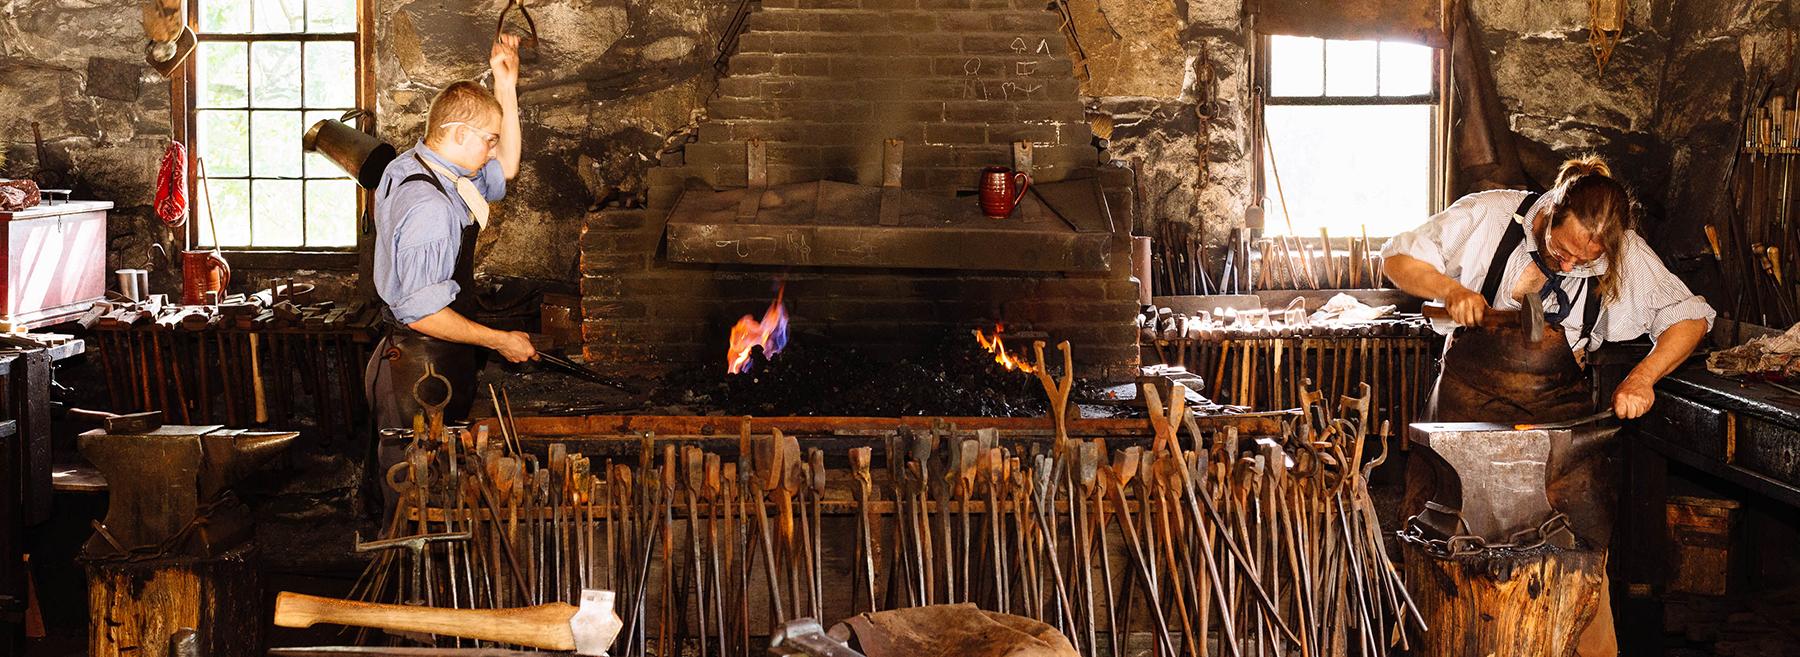 Blacksmiths working at Old Sturbridge Village